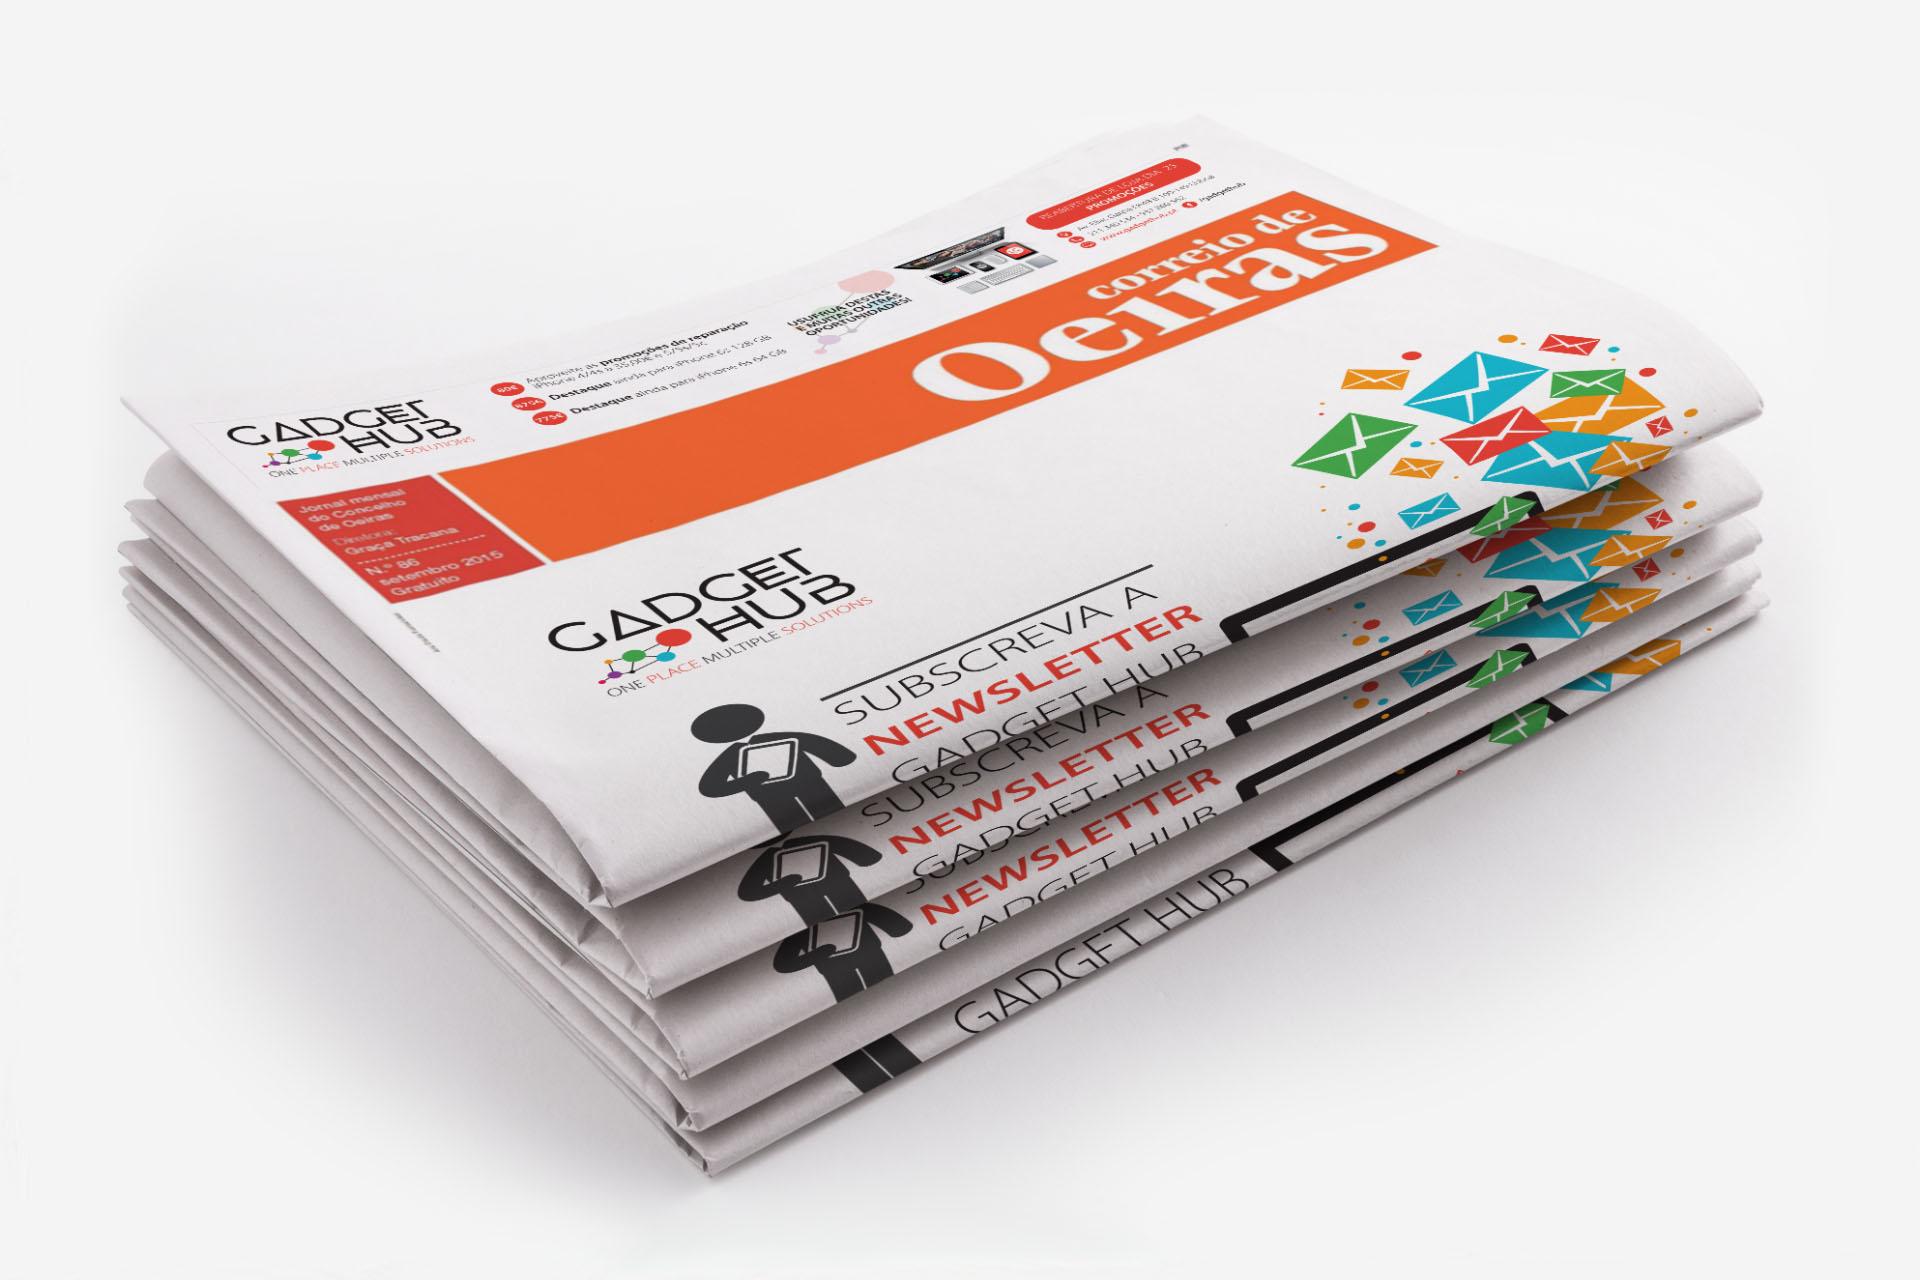 Gadget Hub - Publicidade Jornal de Oeiras